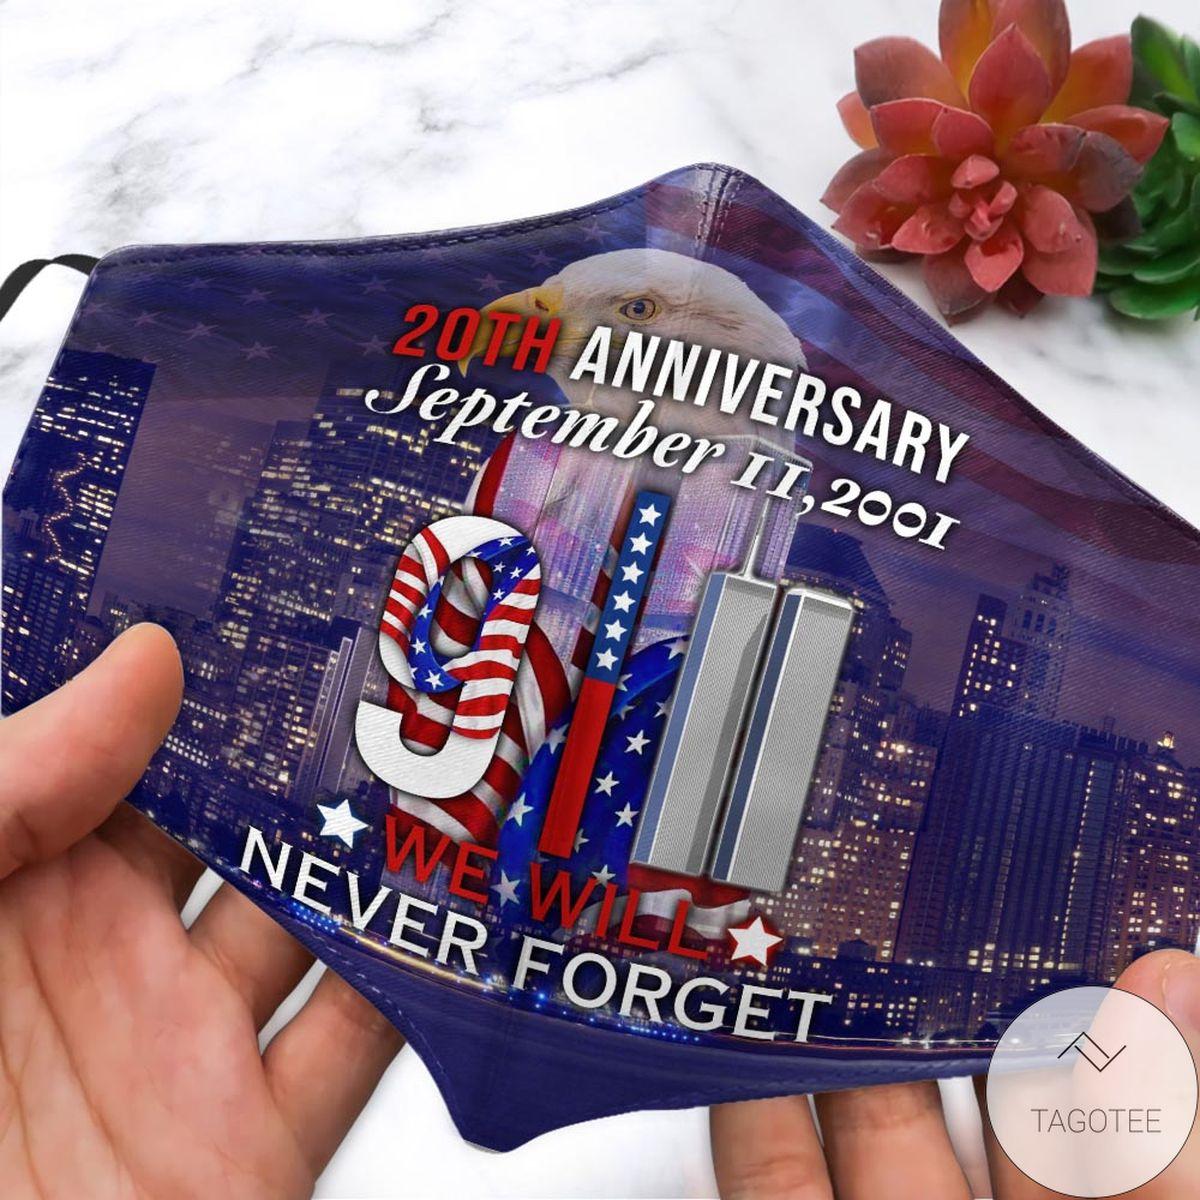 911 Memorial 20th Anniversary September Face Mask